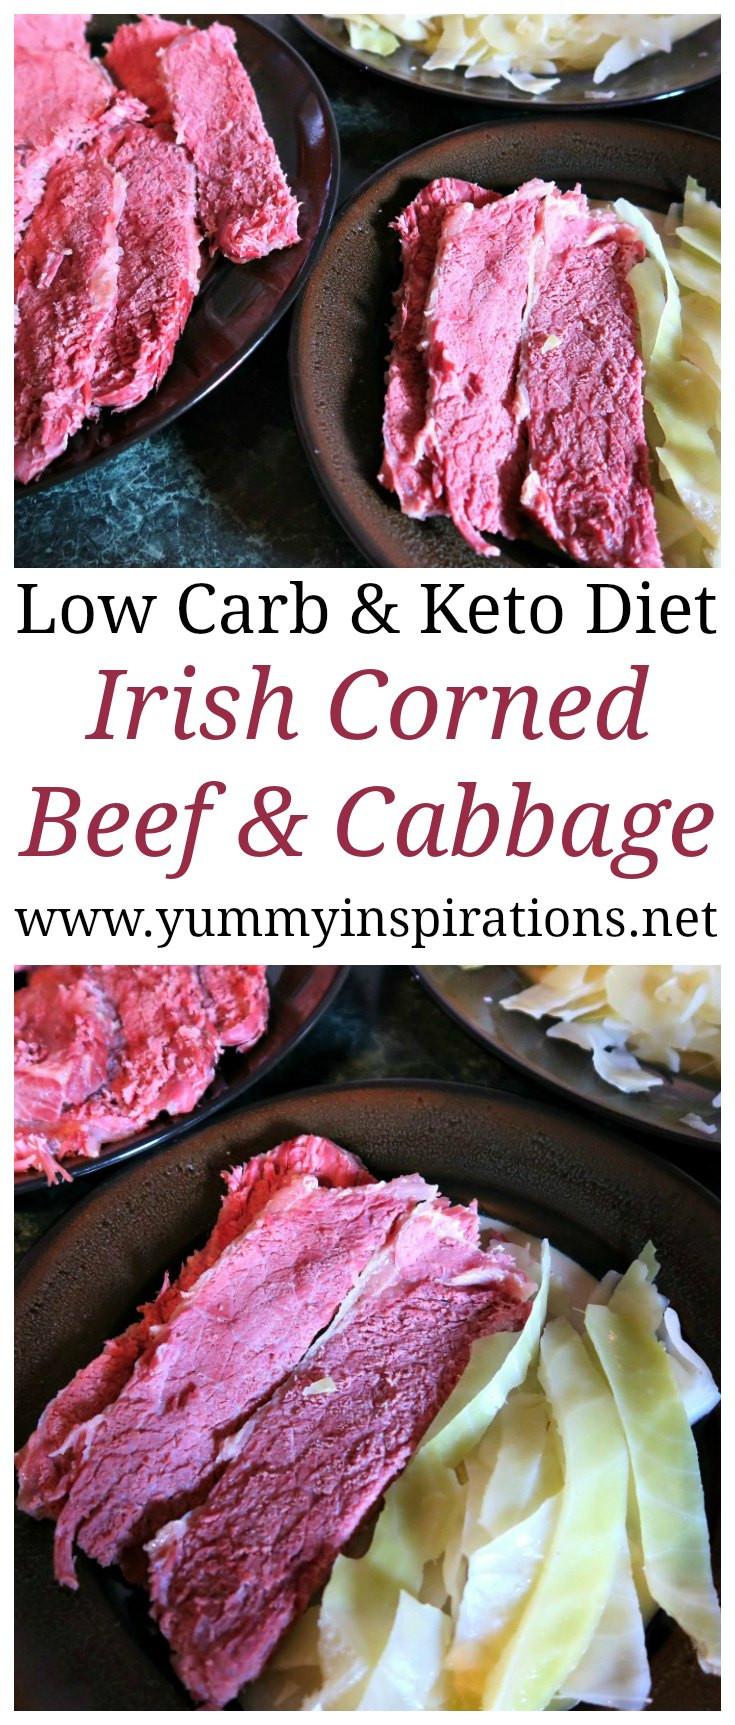 Corn Beef Keto  Authentic Irish Corned Beef and Cabbage Recipe Easy Keto